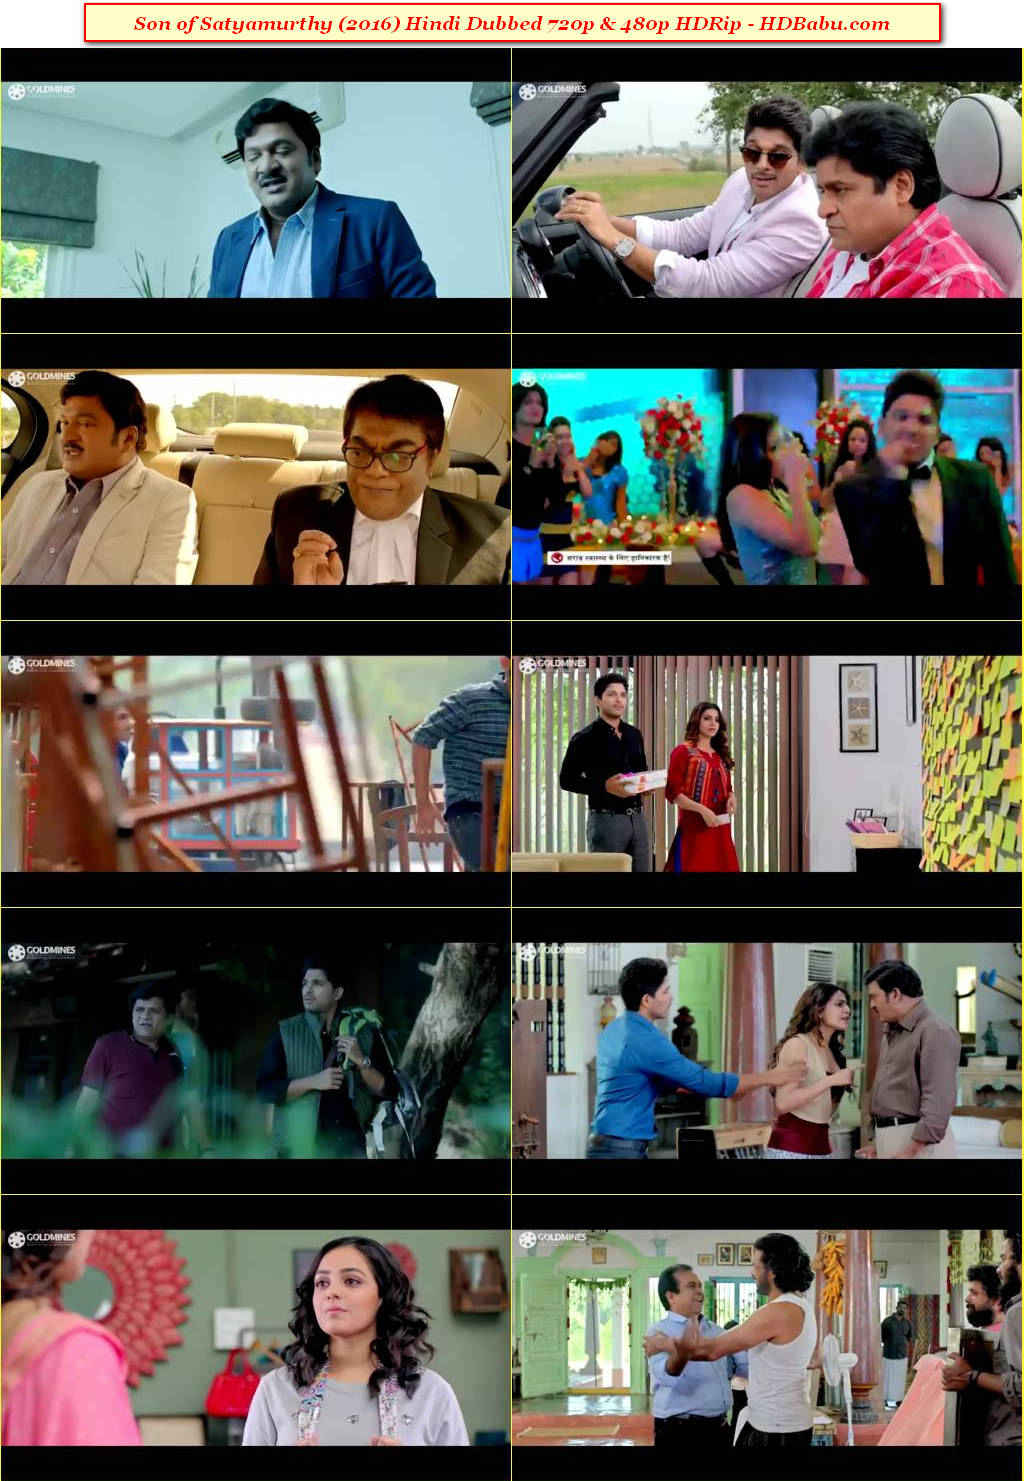 Son of Satyamurthy Hindi Dubbed Full Movie Download 720p, Son of Satyamurthy Full Movie in Hindi Dubbed 480p 300mb download,Son of Satyamurthy hindi dubbed full movie youtube download,Son of Satyamurthy 720p & 480p hindi dubbed full movie download hd free.